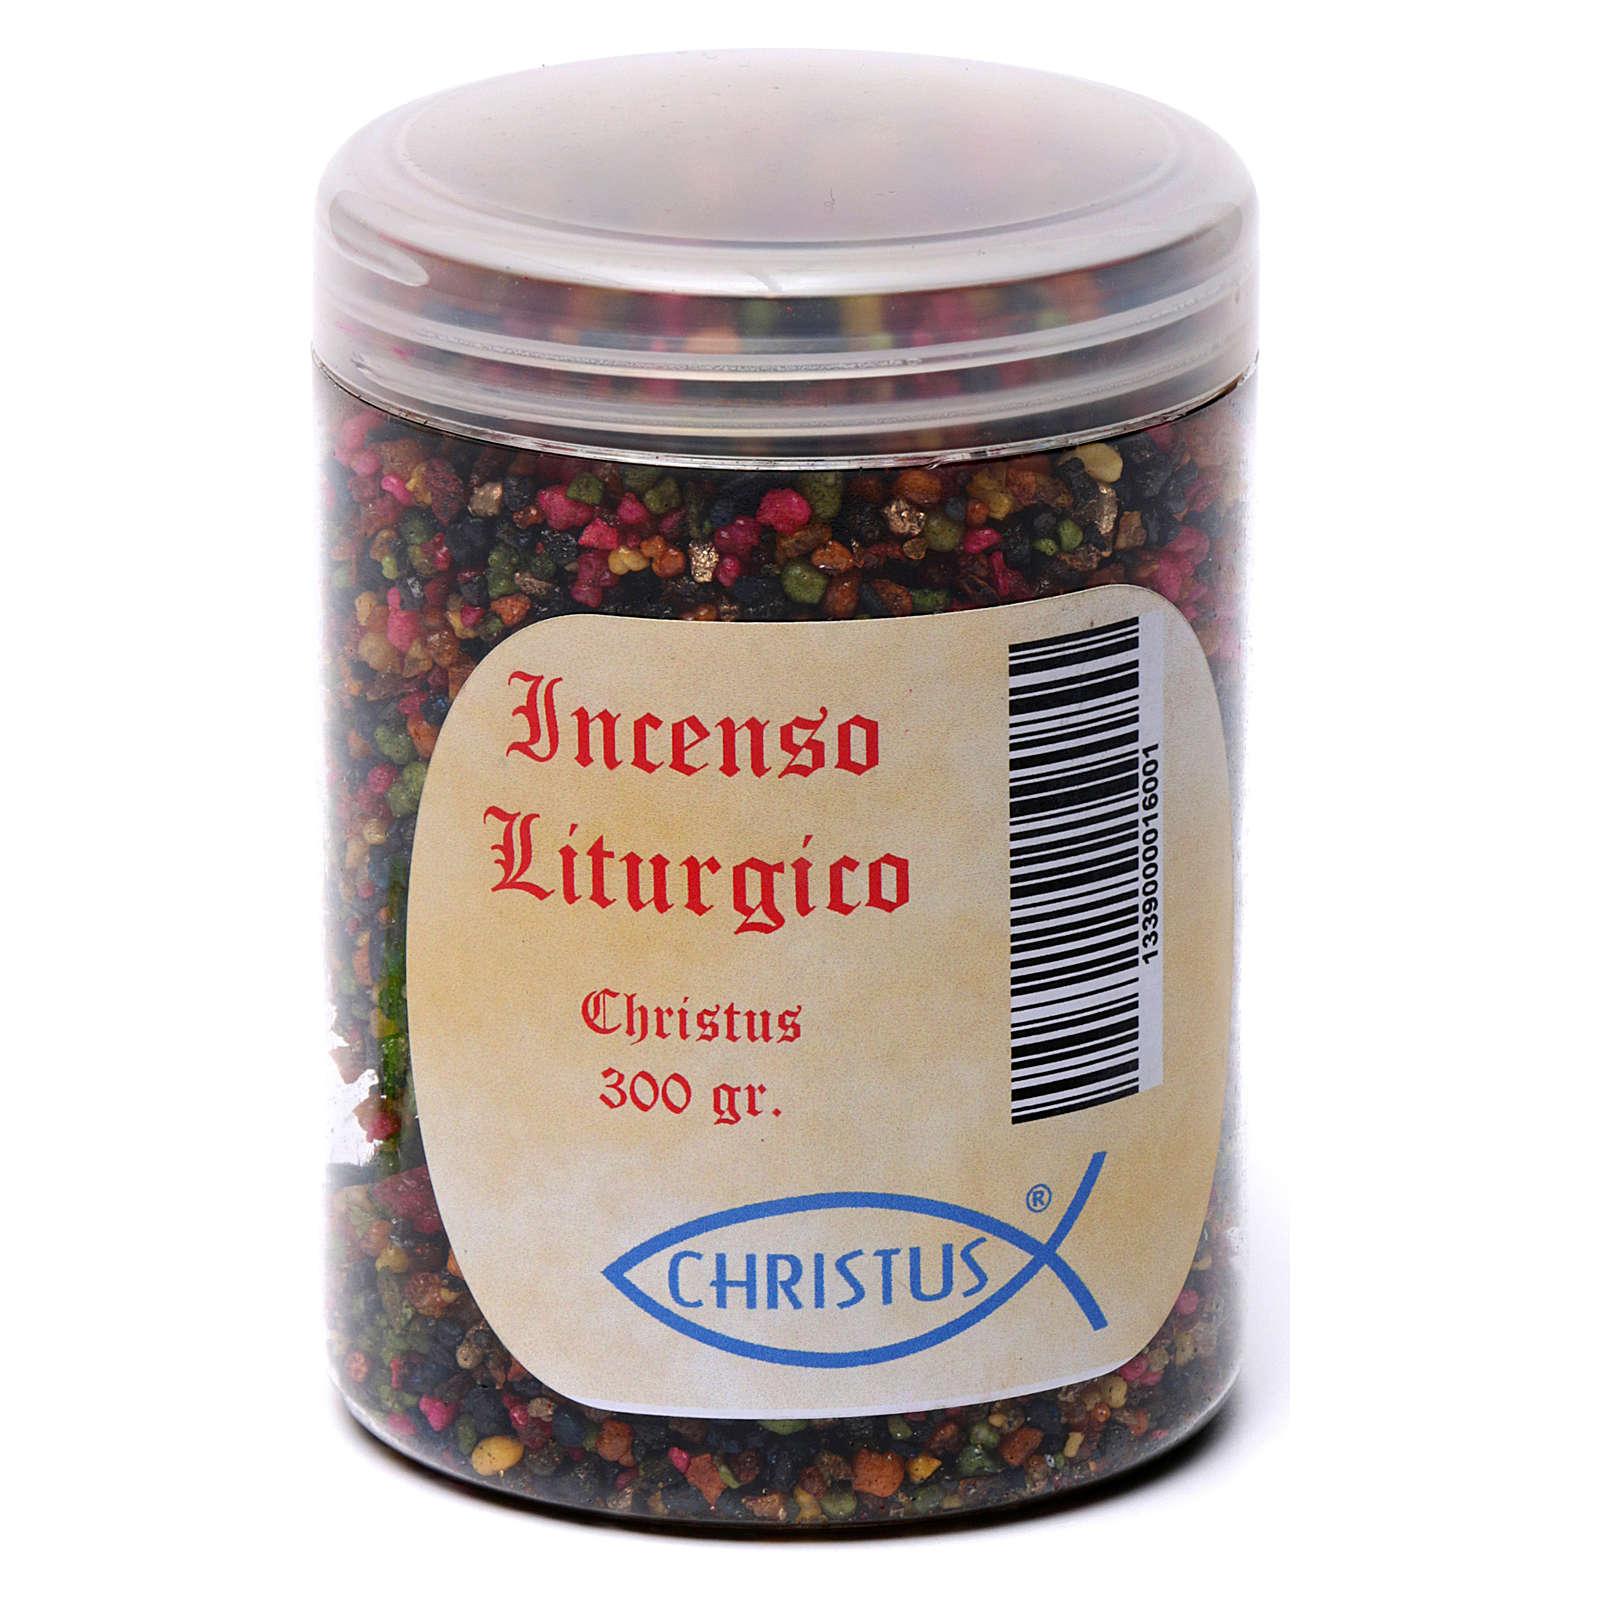 Liturgical incense Christus 300g 3